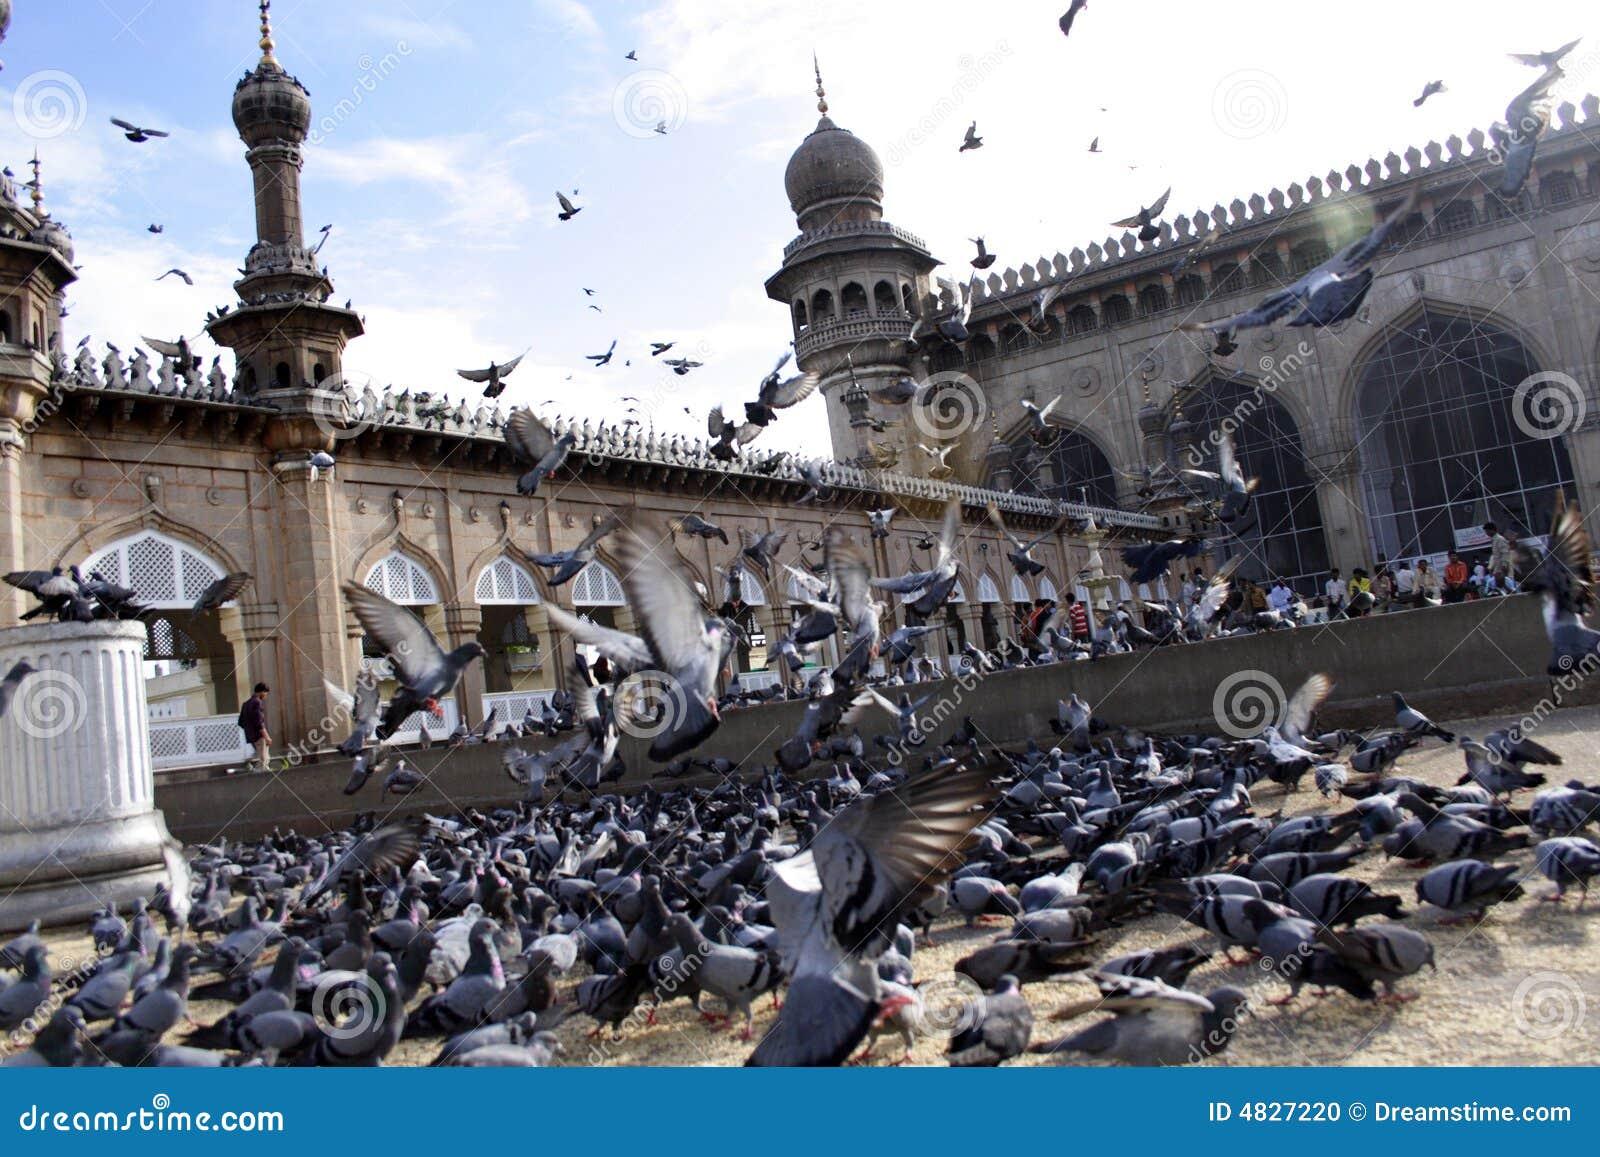 Meca Masjid, Hyderabad